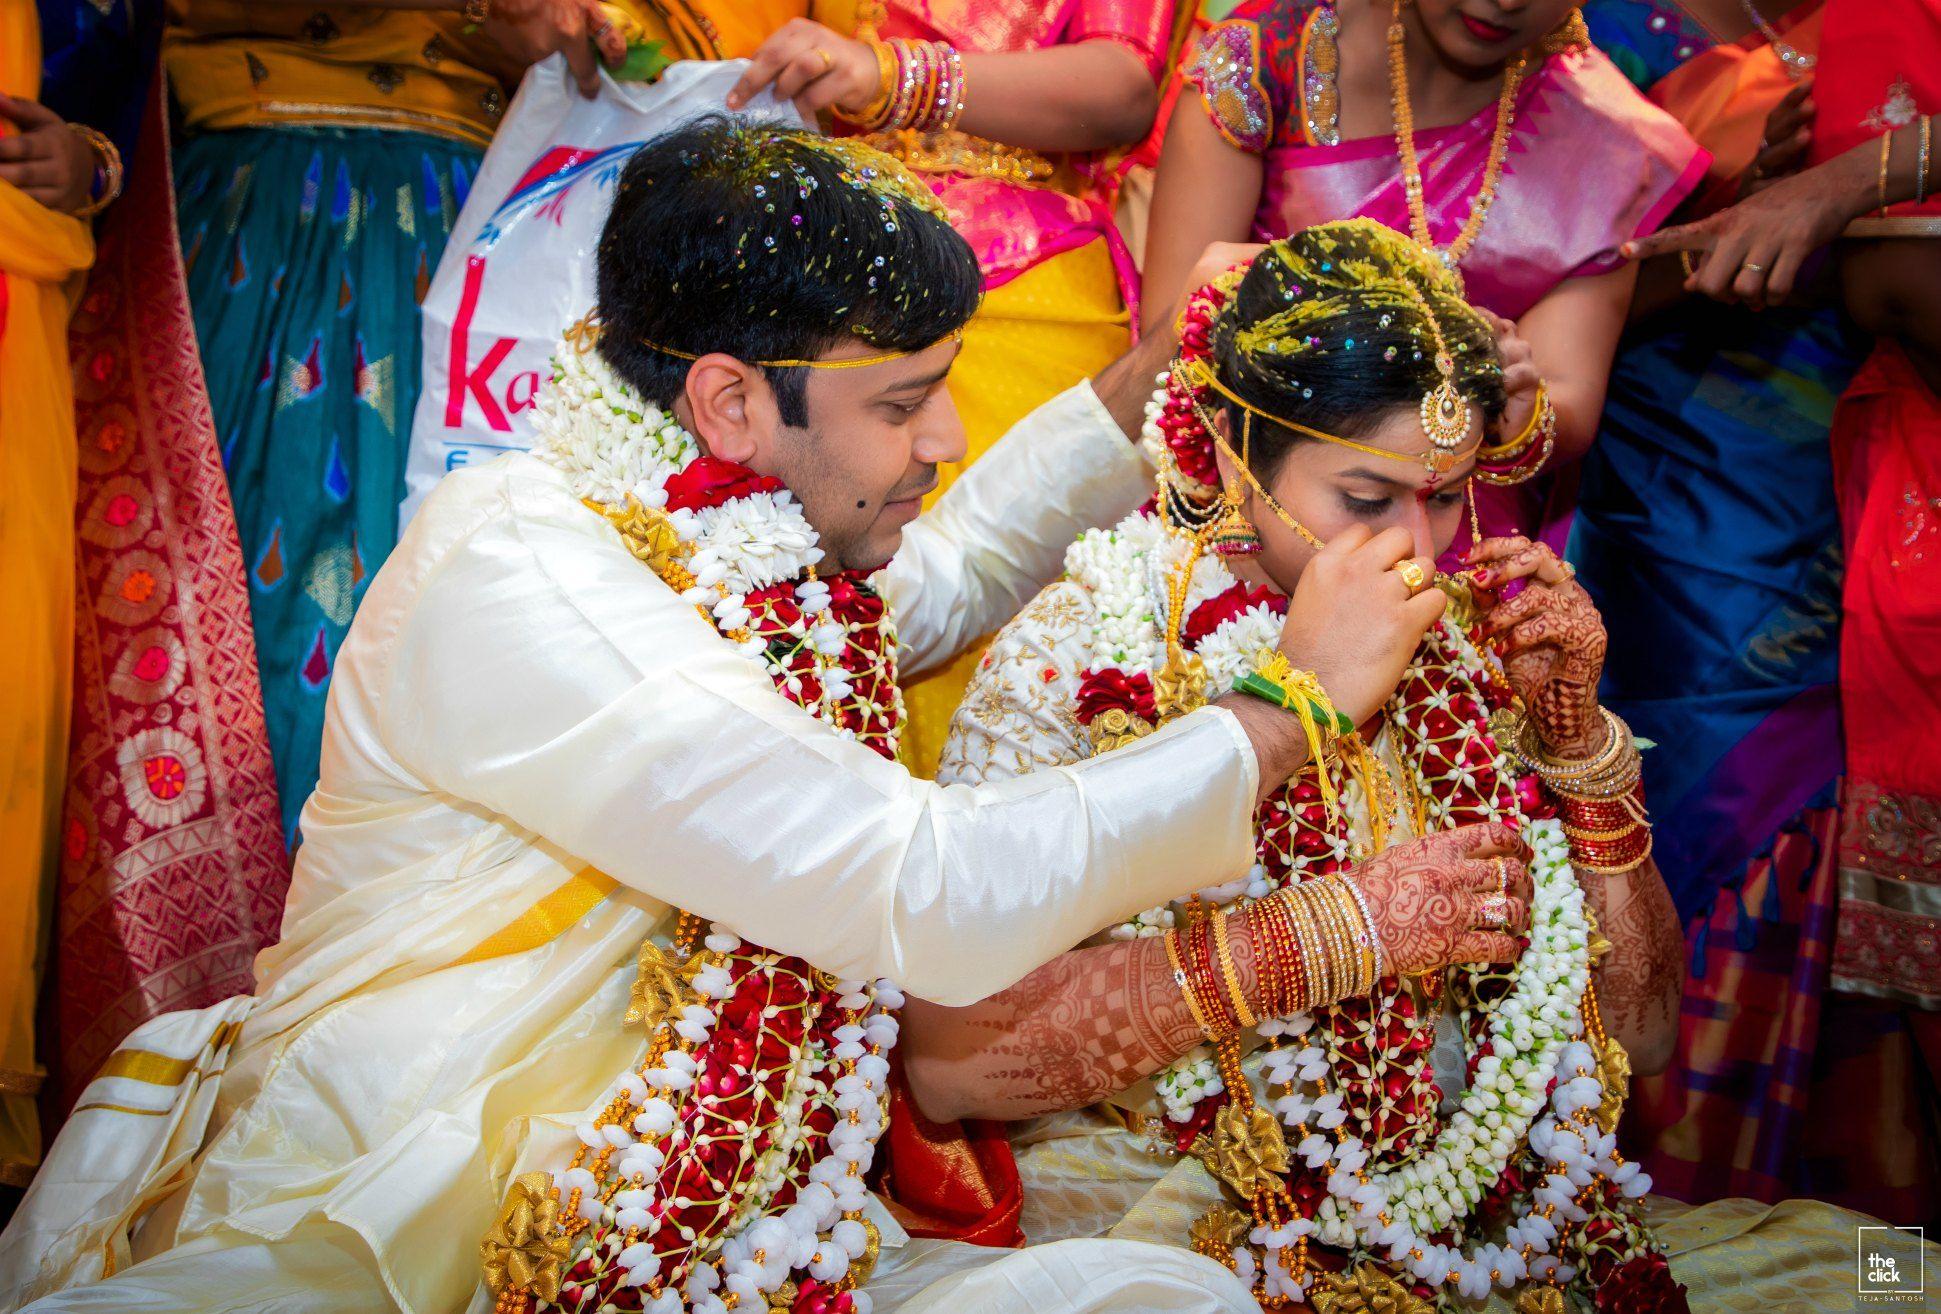 15 Hindu Telugu Rituals For Your Traditional Indian Wedding Day Traditional Indian Wedding Indian Wedding Photography Poses Indian Wedding